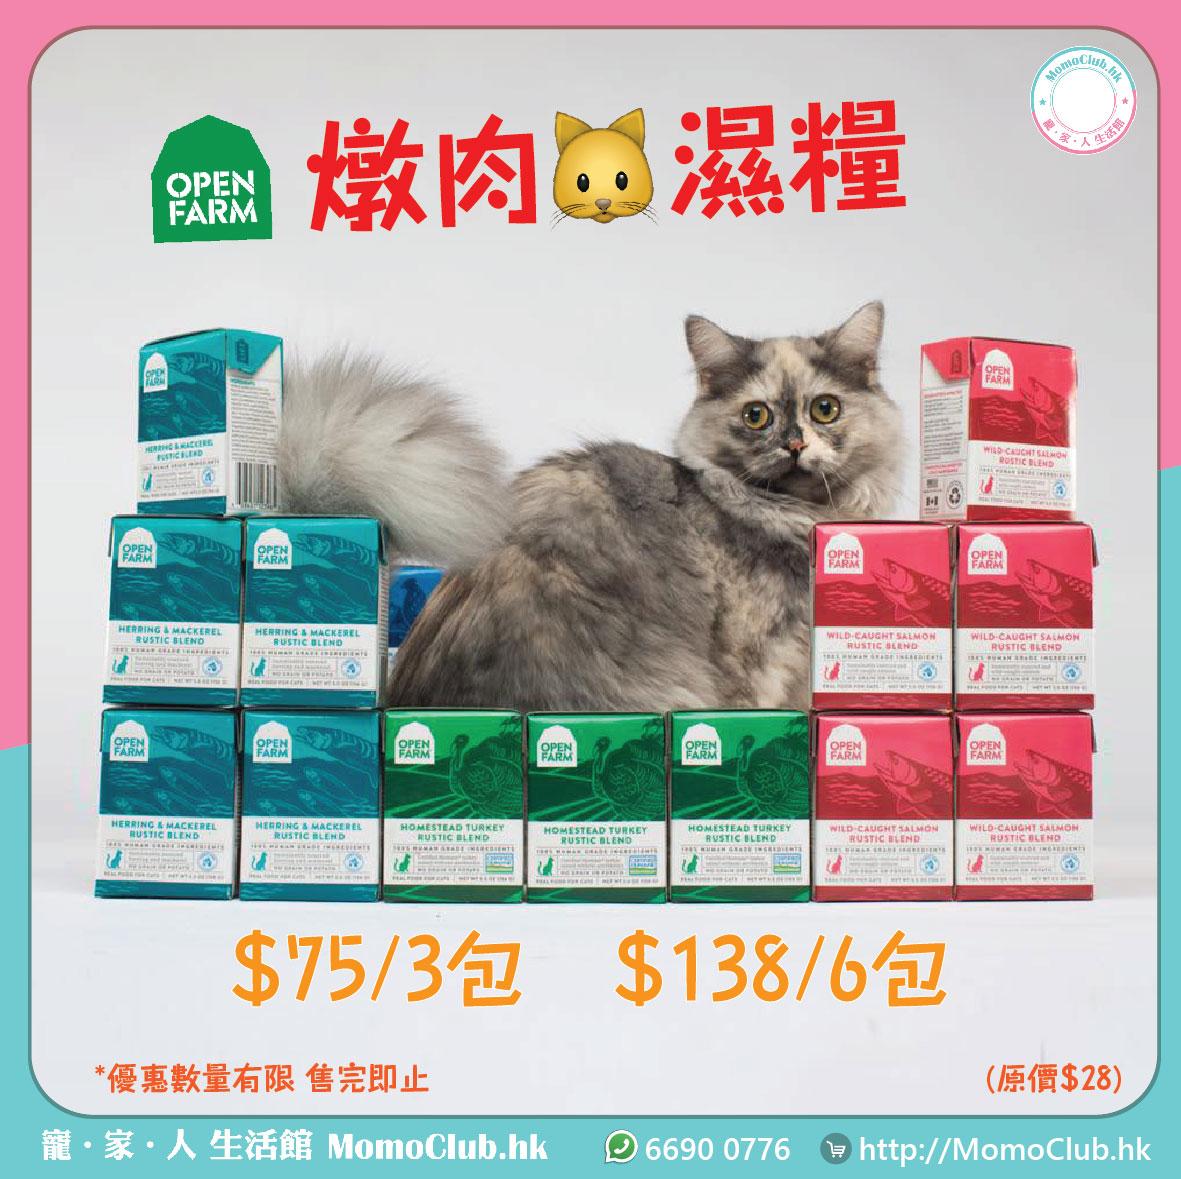 Open Farm 燉肉貓濕糧 $75/3包 | $138/6包